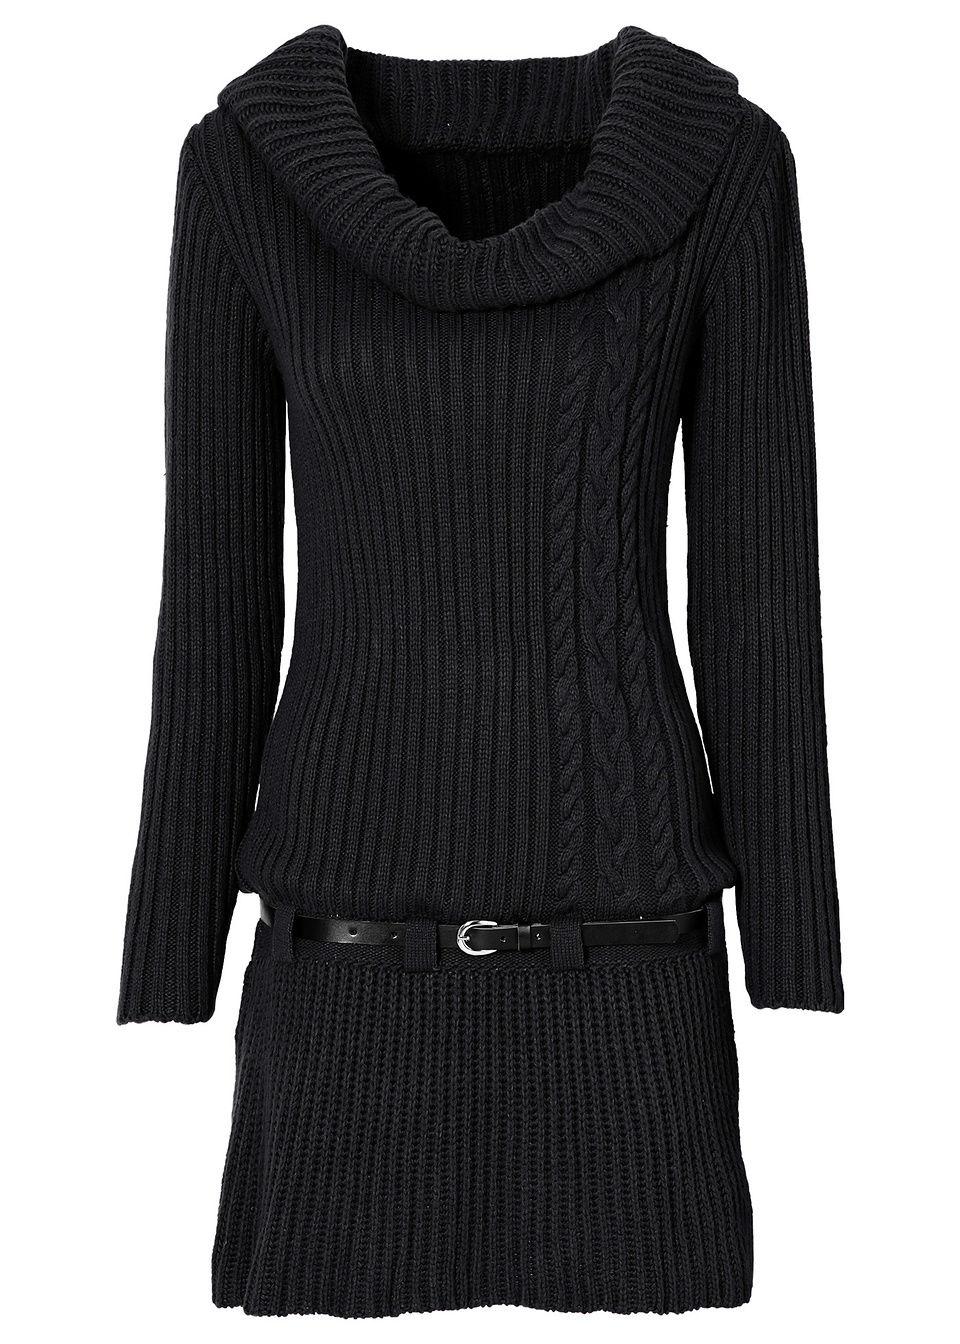 922f381628e BODYFLIRT Pletené šaty s opaskom bonprix    dressie.sk